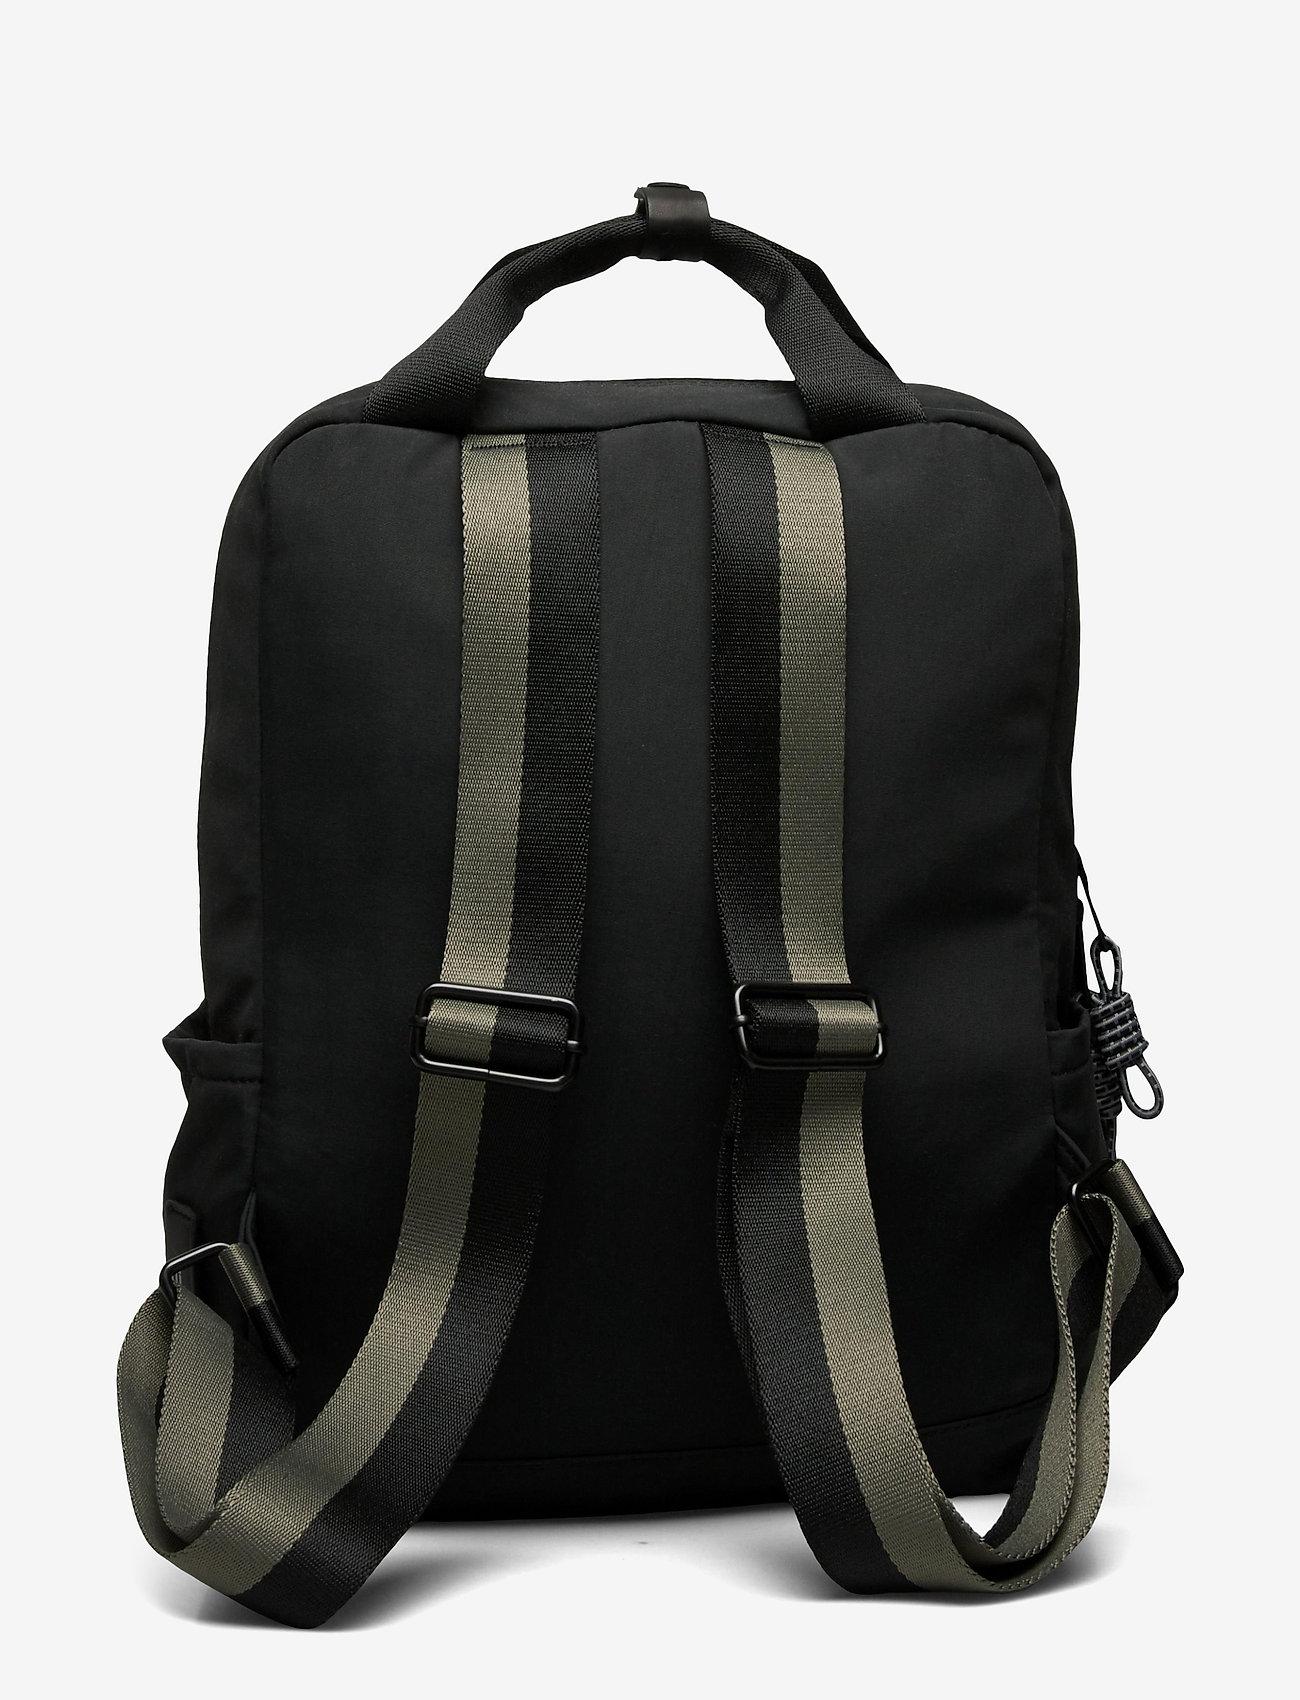 ECOALF - NARA BACKPACK - tassen - black - 1